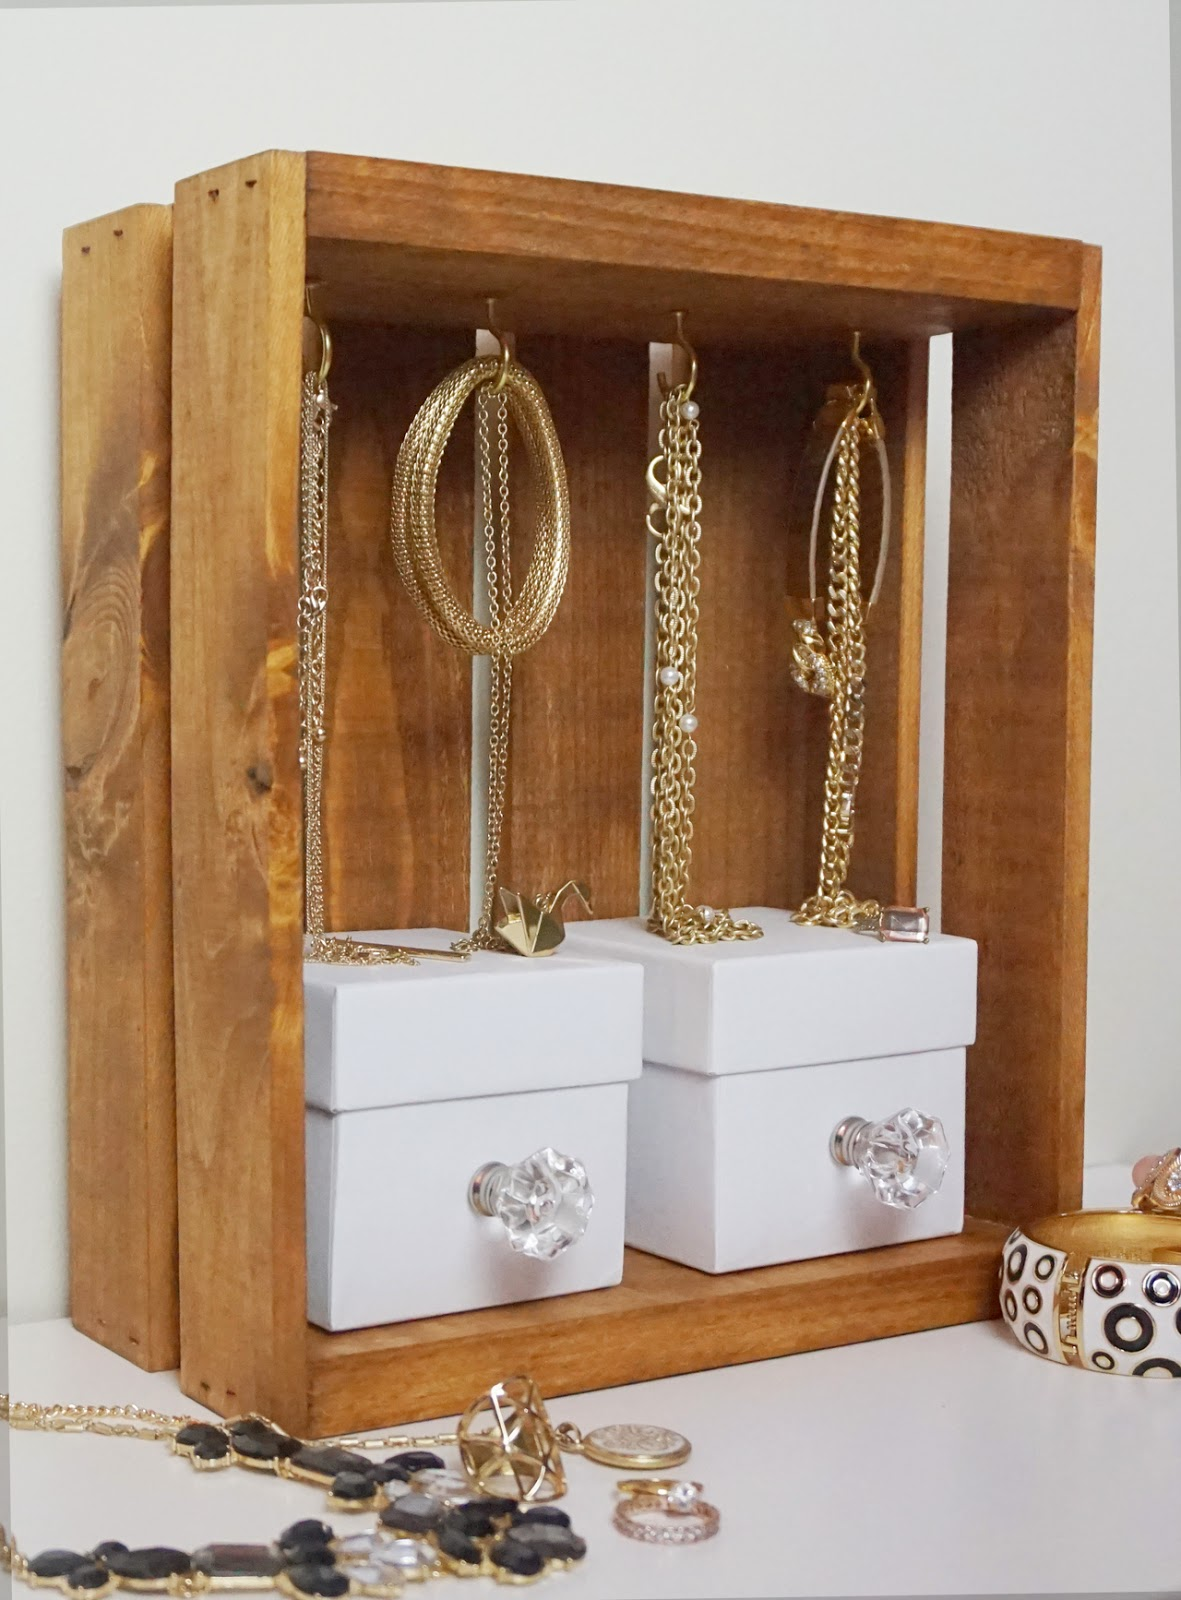 Crate Jewelry Display